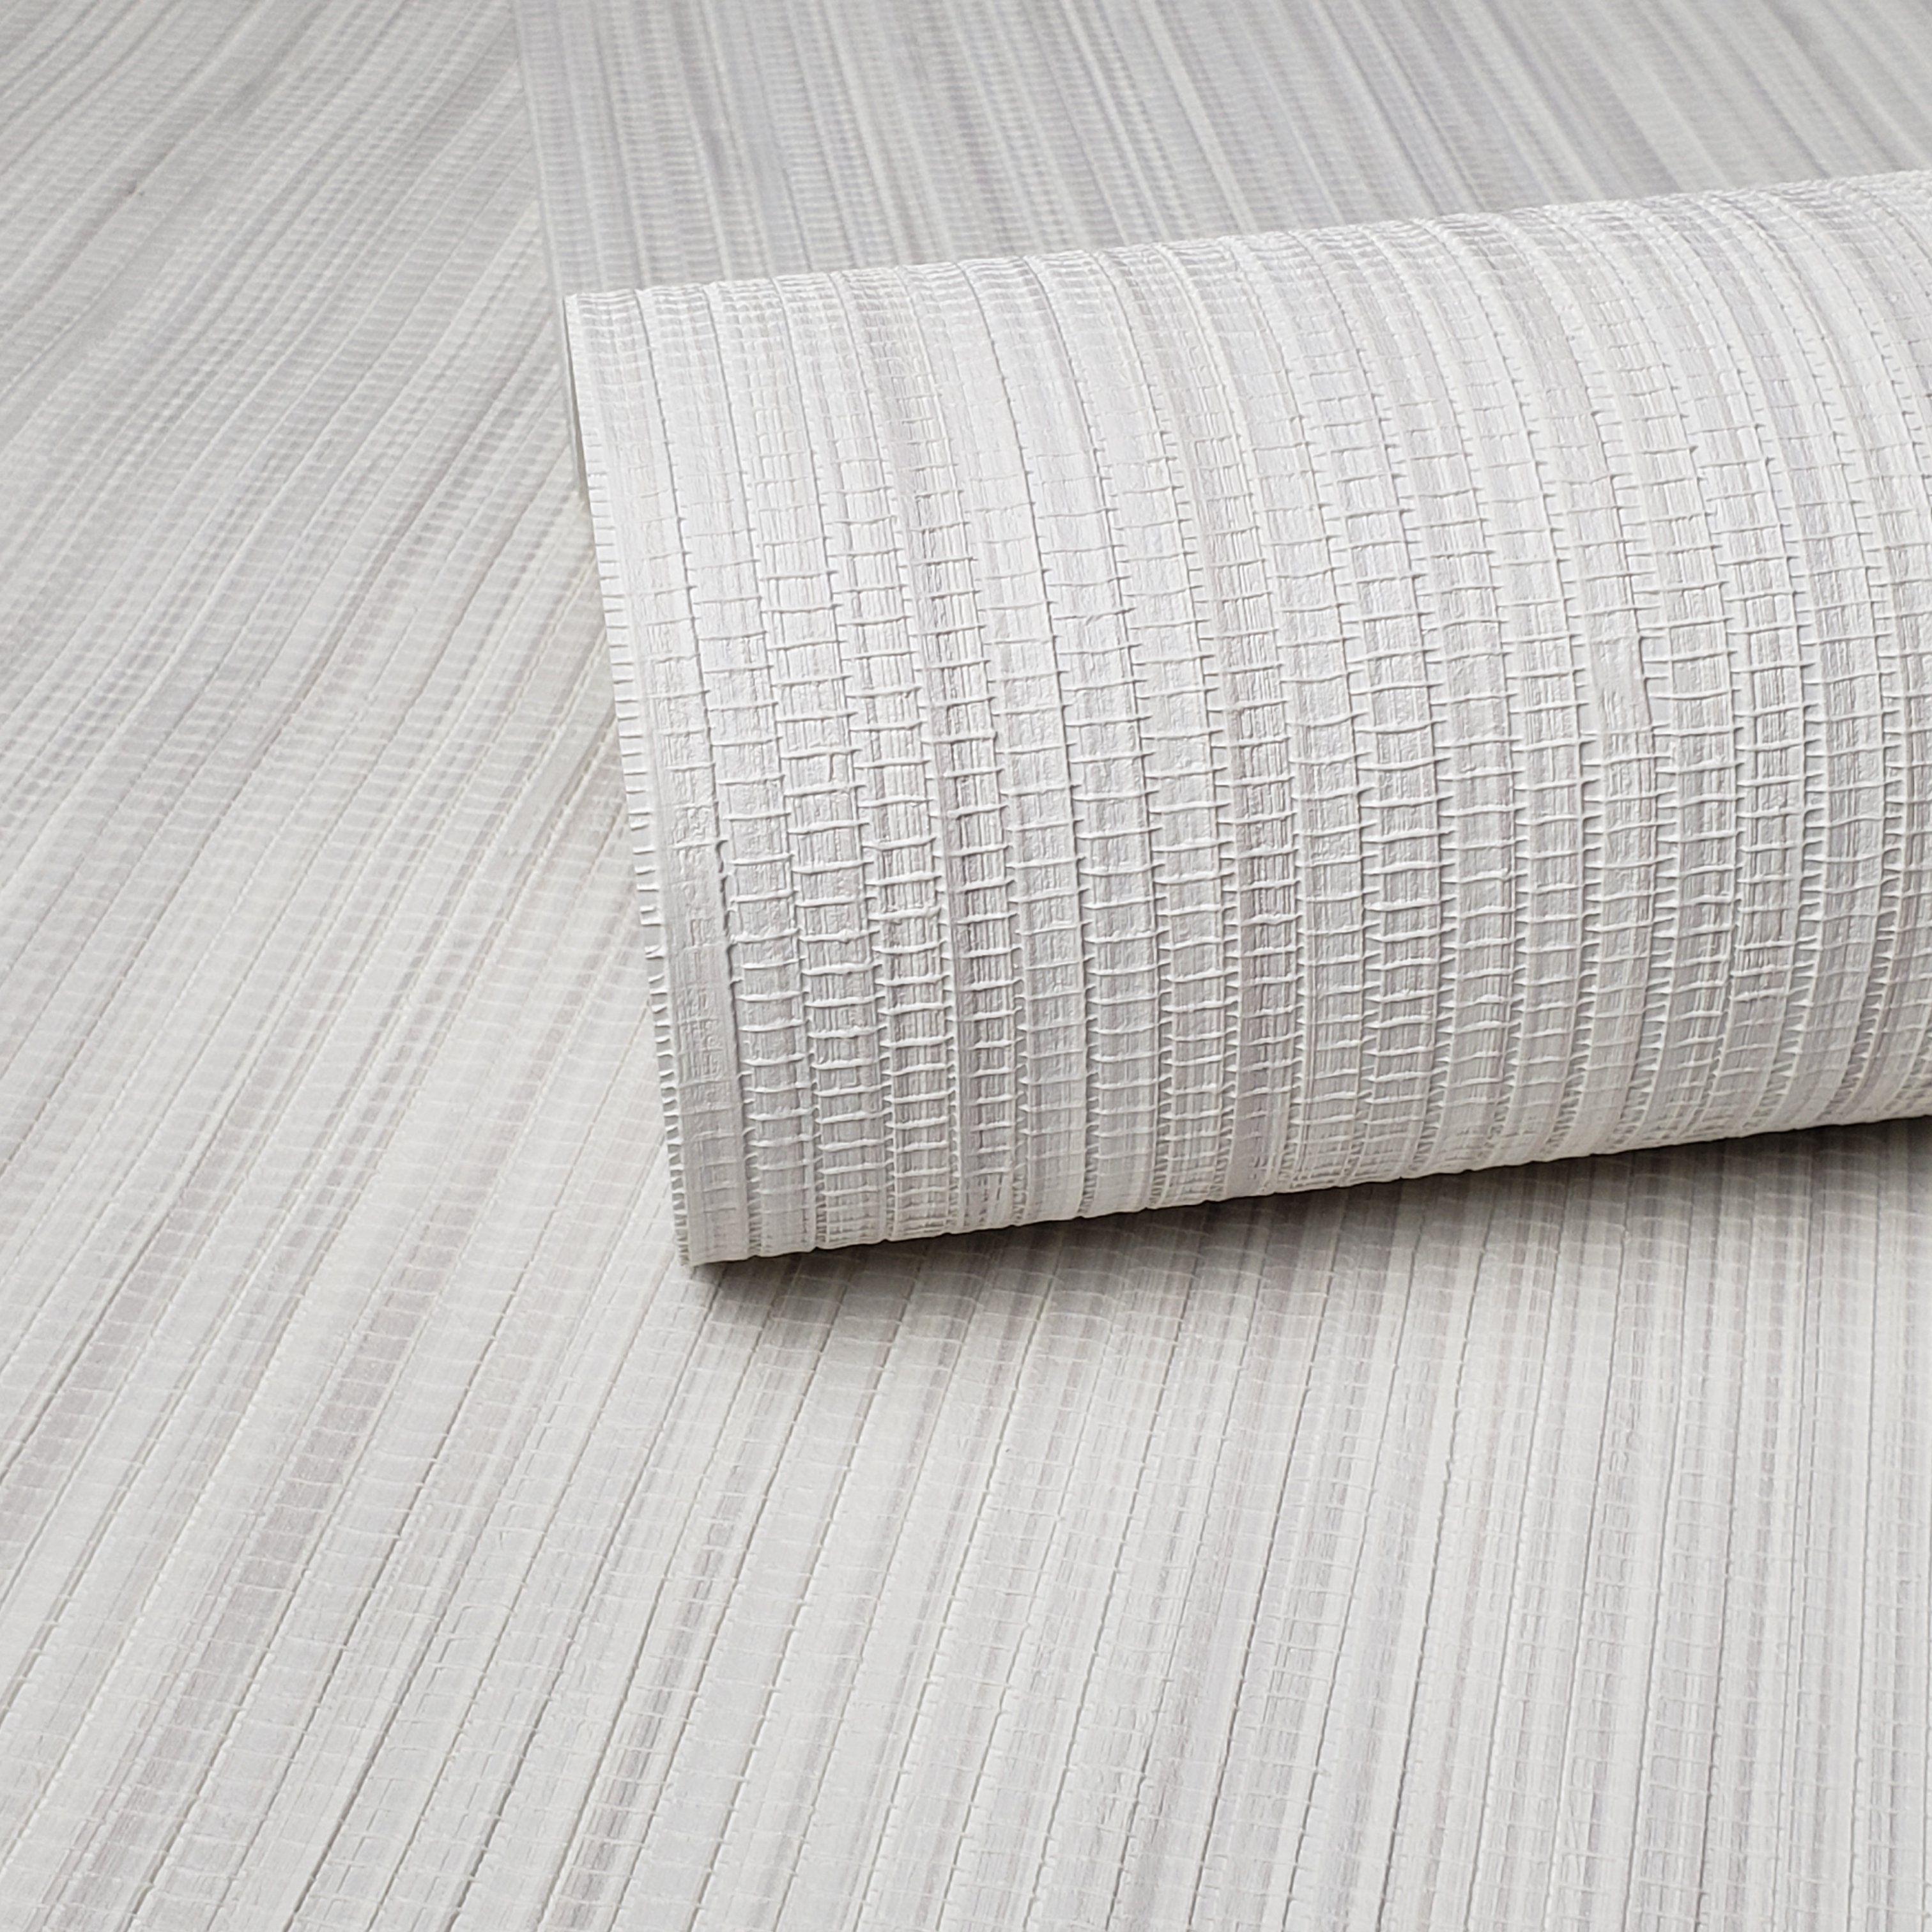 WM8803001 Wallpaper off white gray Cream Textured faux